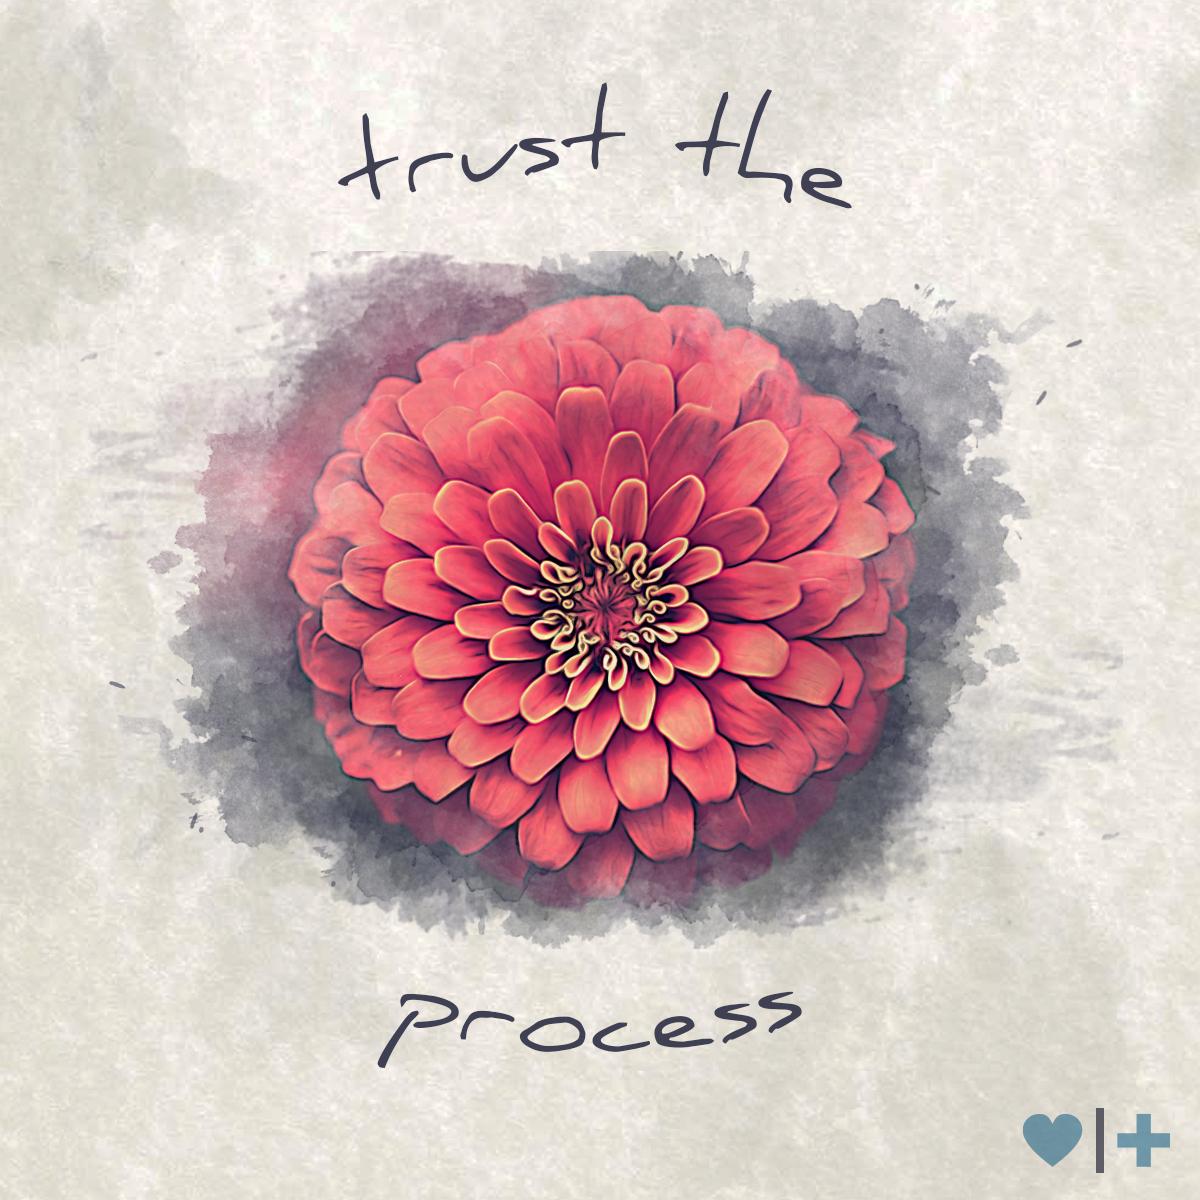 affair-recovery_survivors-blog_christine_trust-the-process